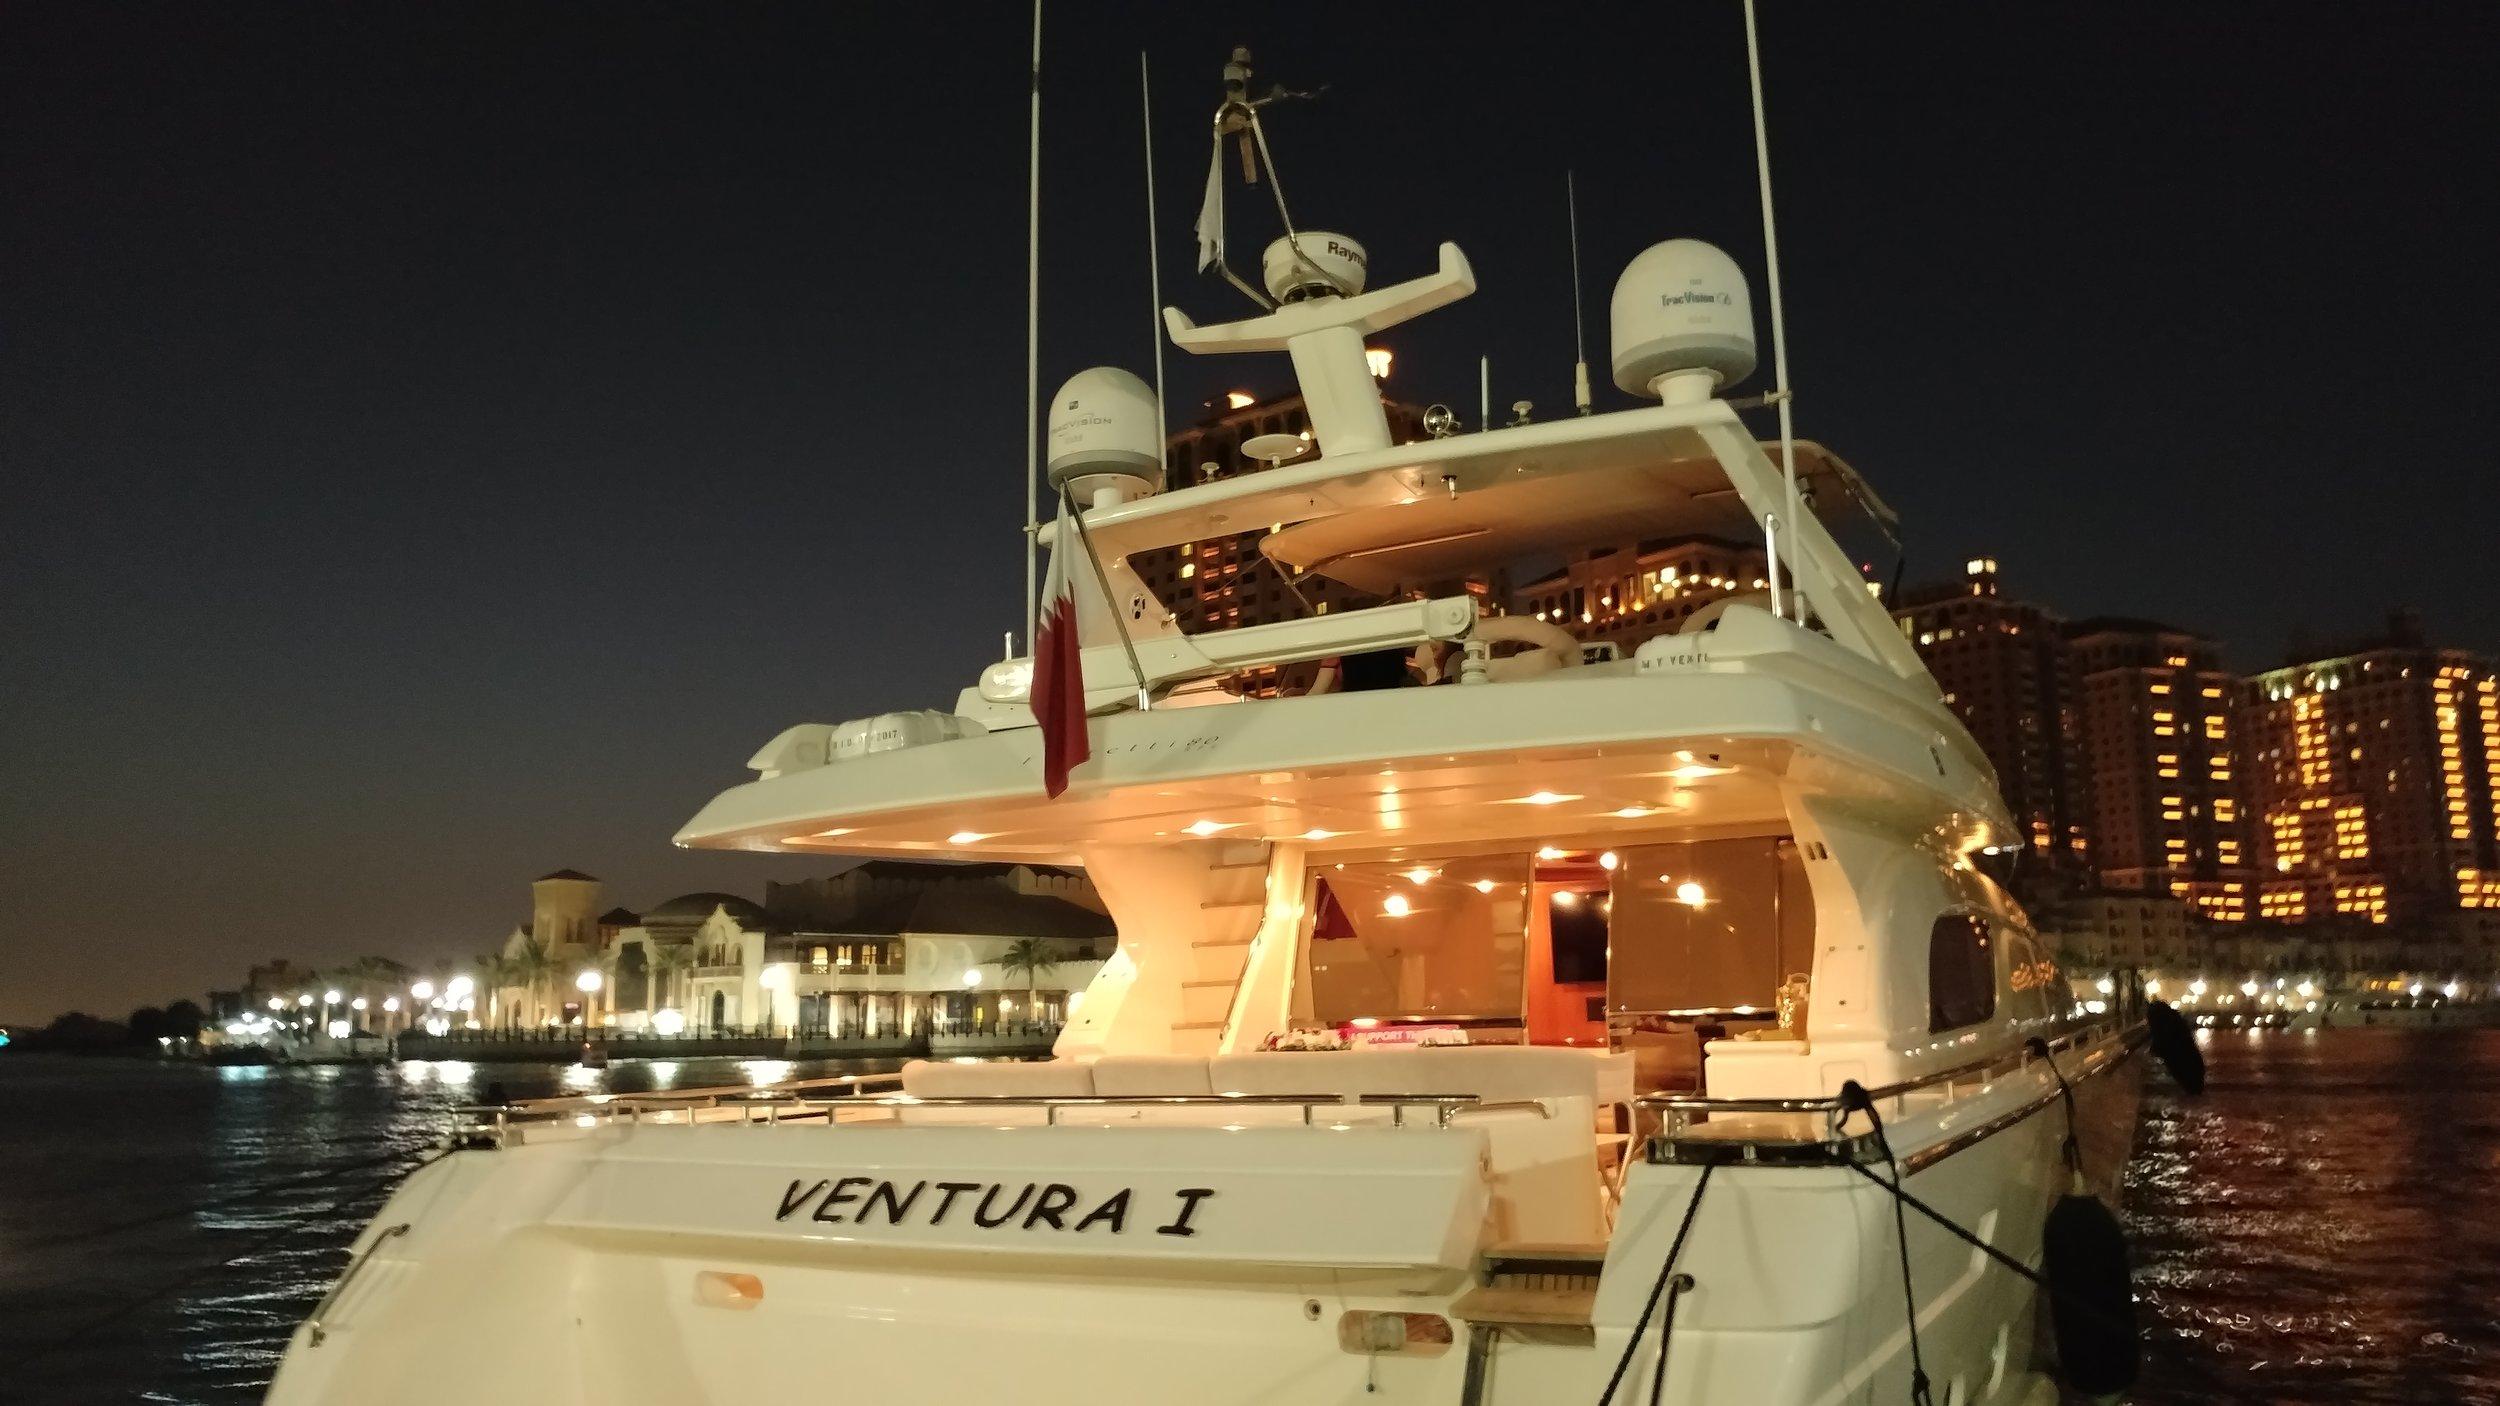 qatar-blogger-luxury-yacht-arabian-sea-creativitywithkay-khansa